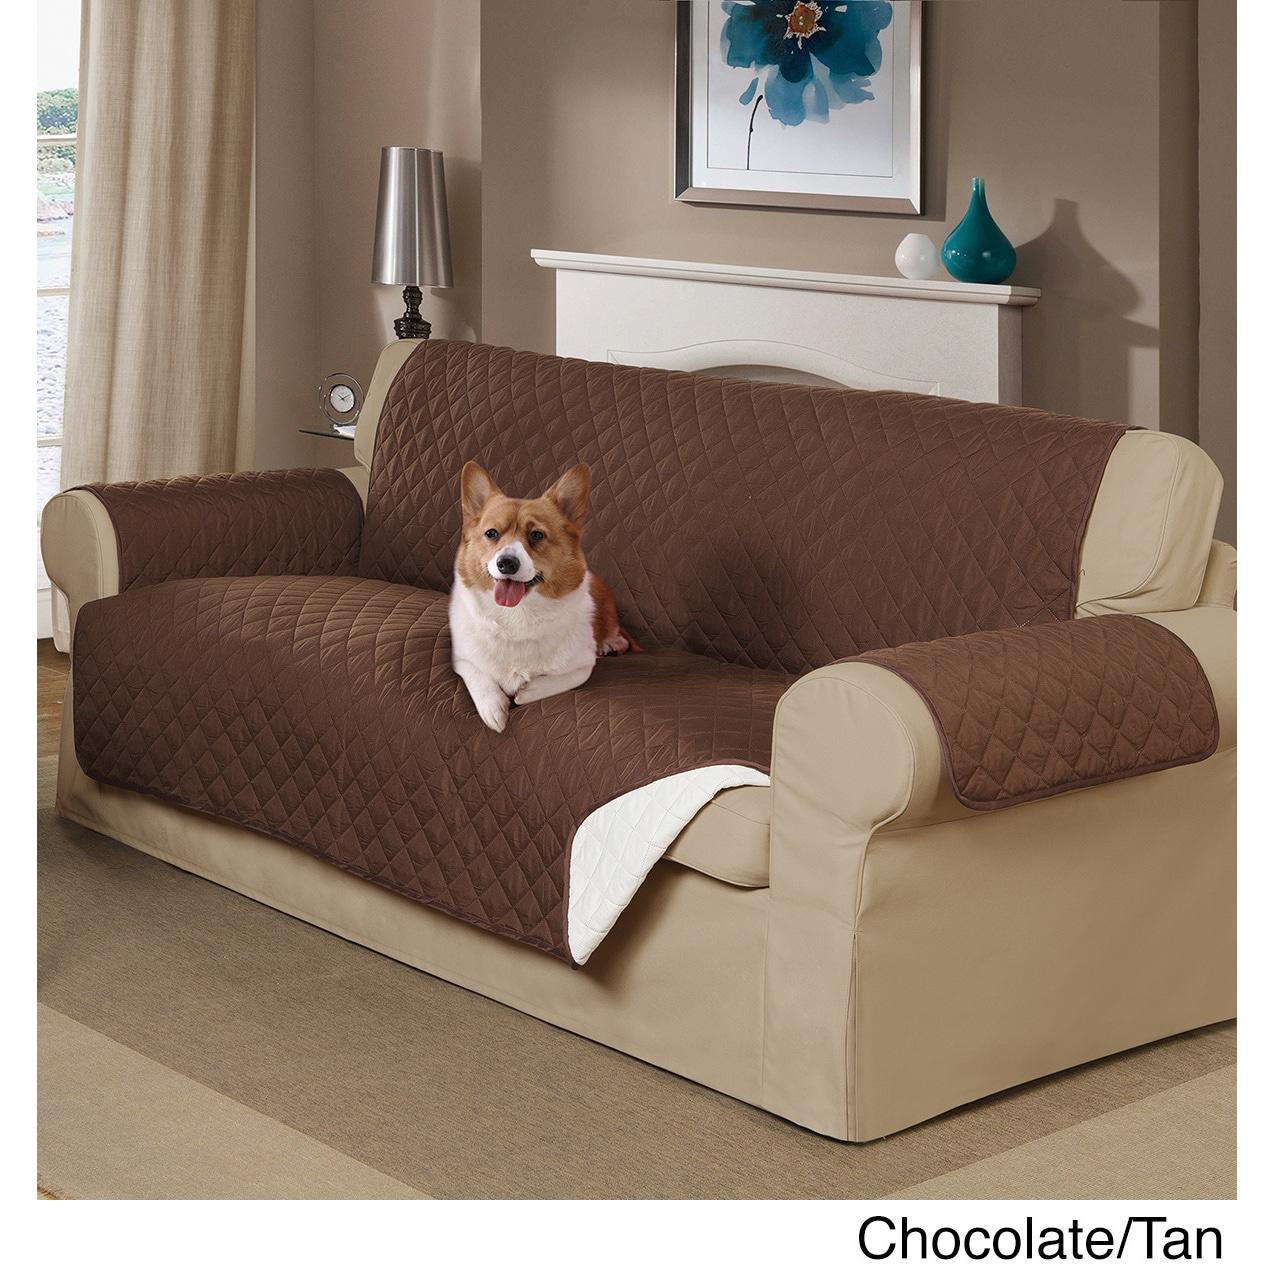 Home Decor Reversible Pet Sofa Cover (Chocolate/Tan), Bro...